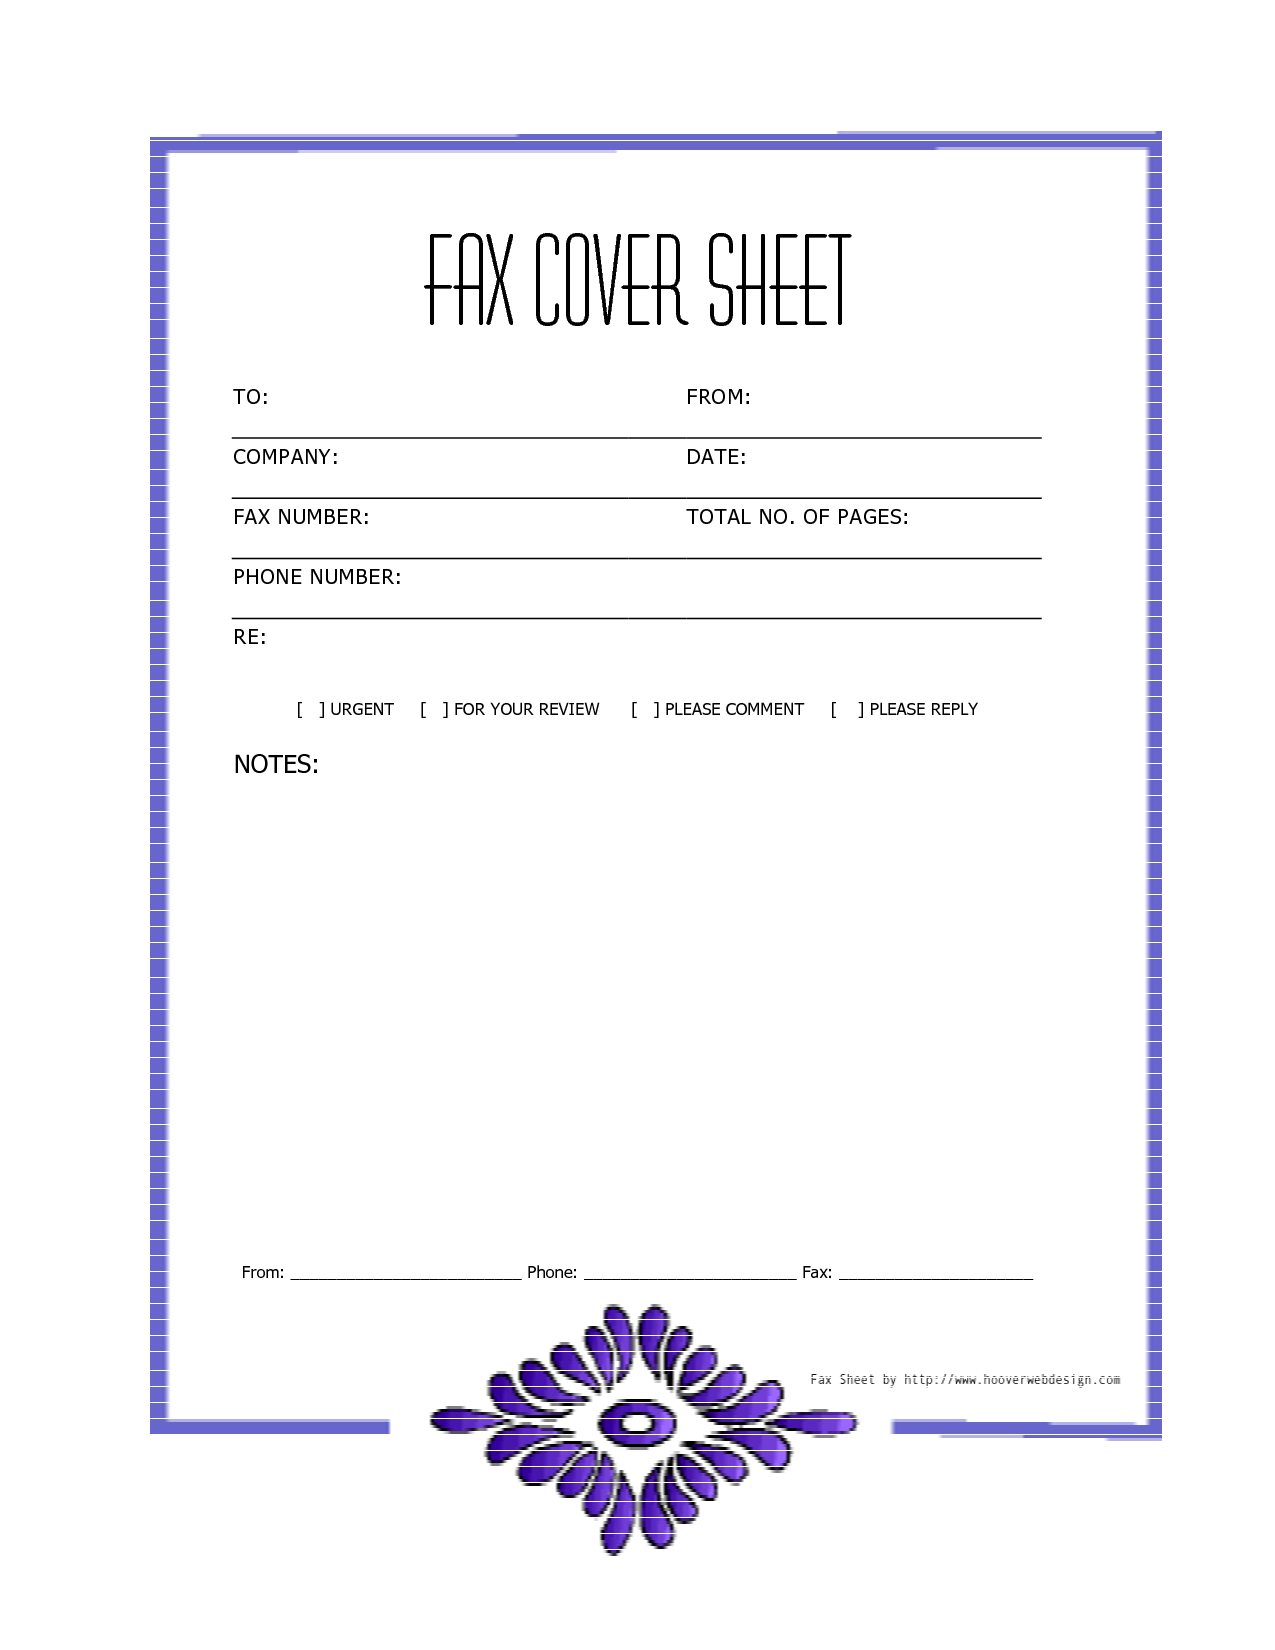 New Print Fax Cover Sheet Xls Xlsformat Xlstemplates Xlstemplate Fax Cover Sheet Cover Sheet Template Cover Letter Sample